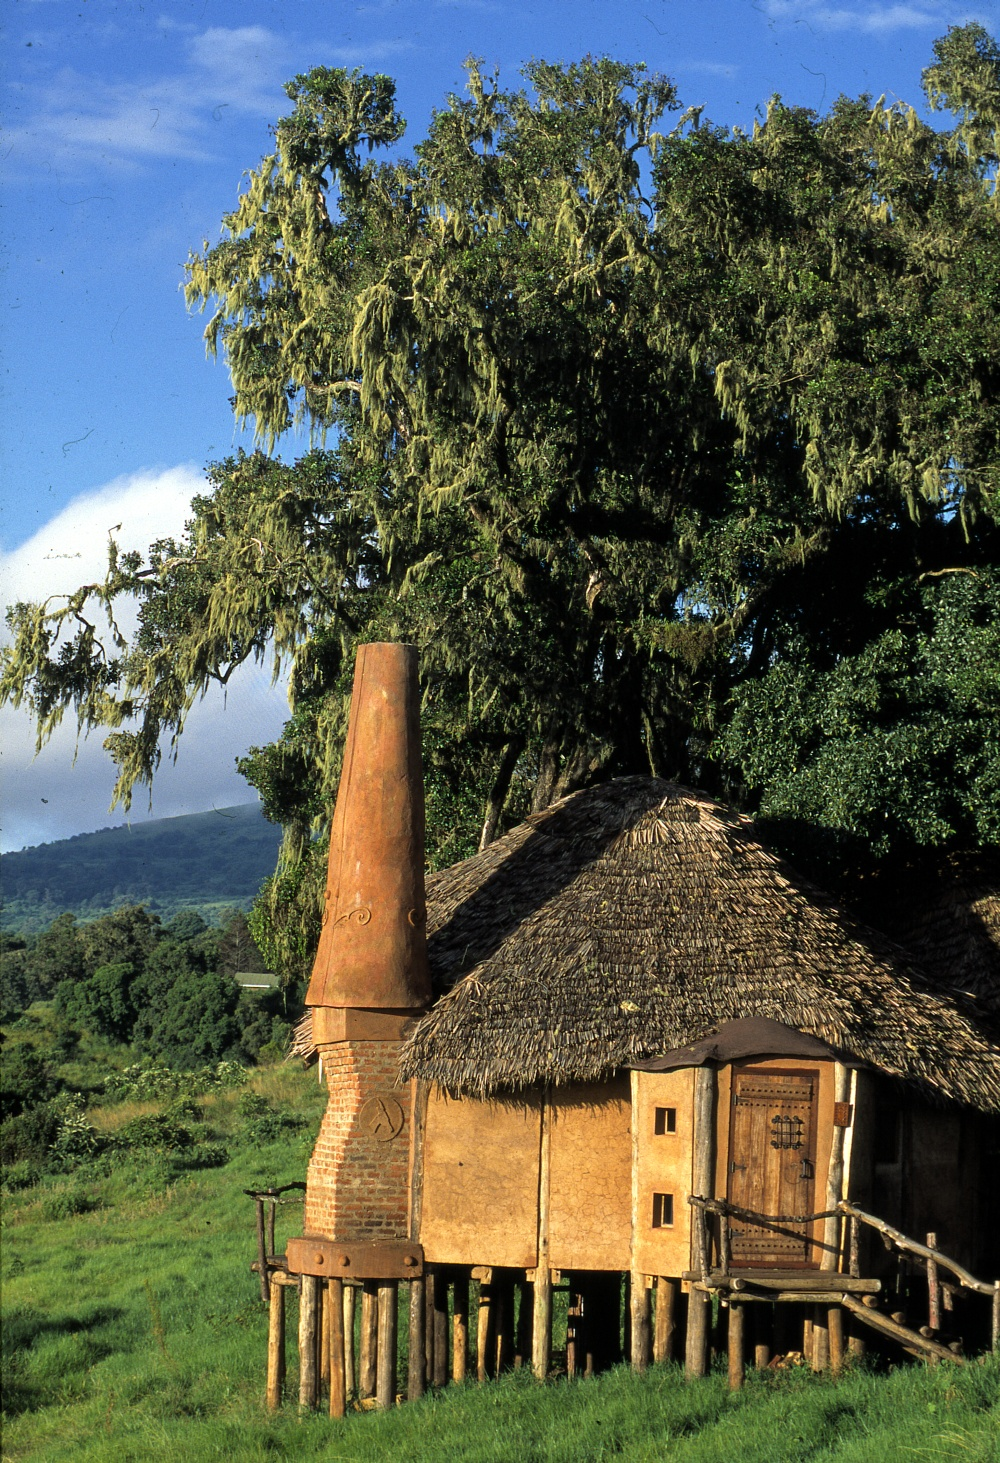 andBeyond Ngorongoro Crater Lodge  Pristine wilderness safari and luxury